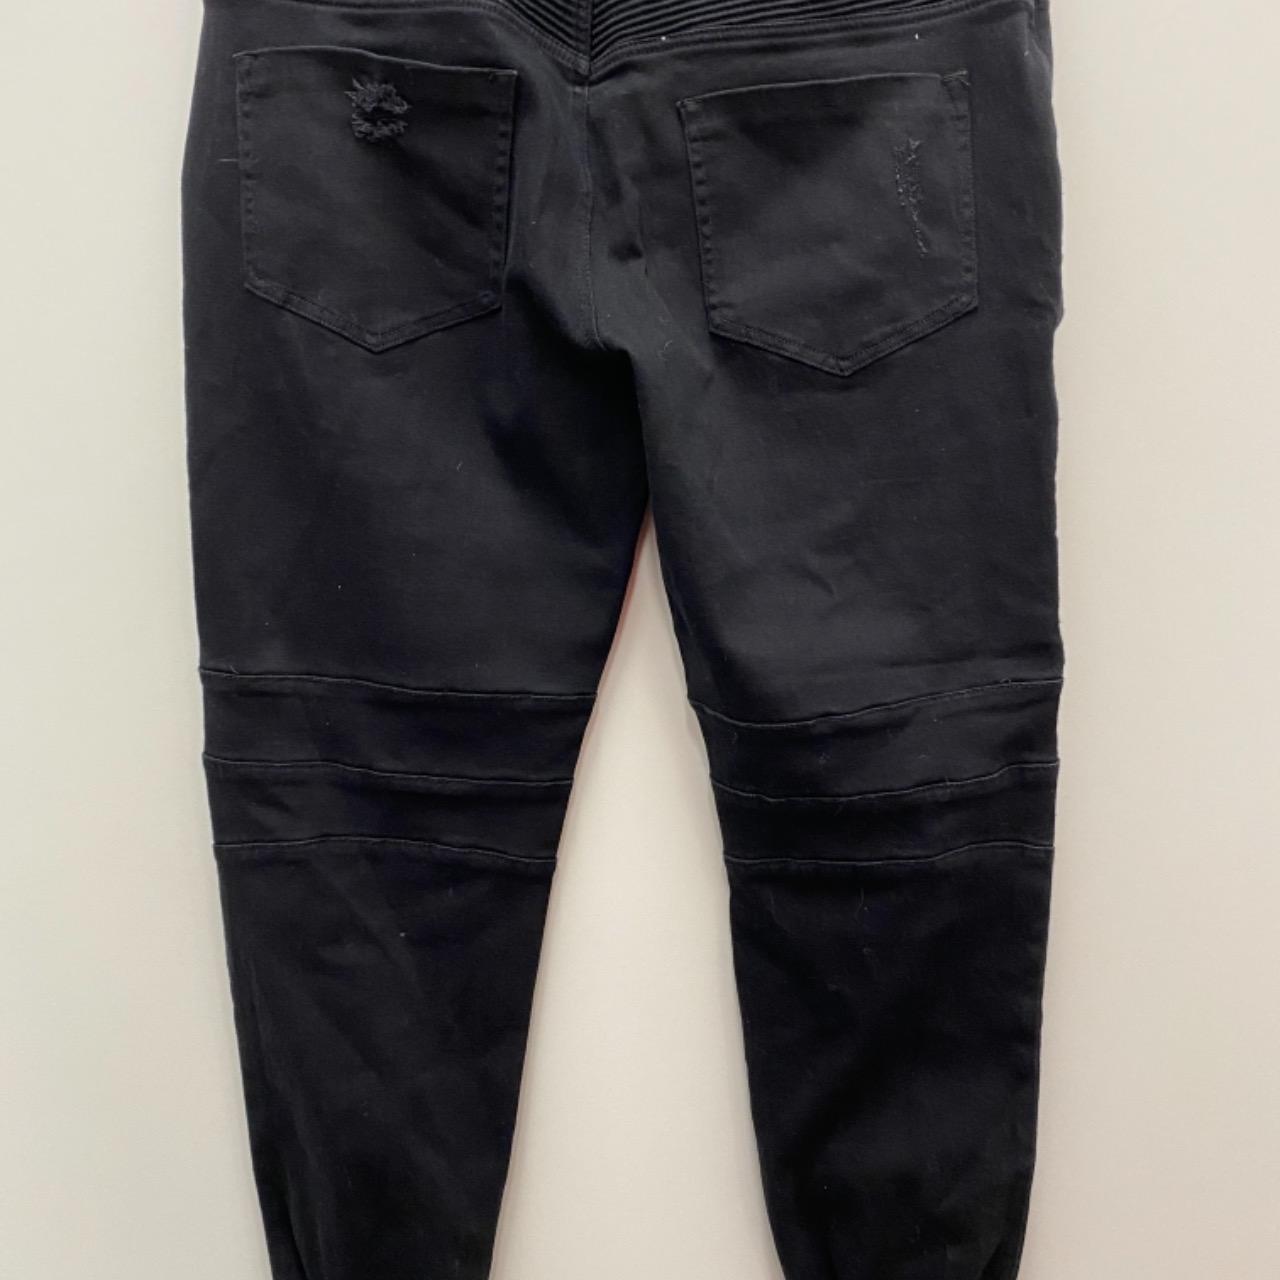 BNWT  Mens  HENLEYS Size 38 Straight Jeans Black RRP $109.95